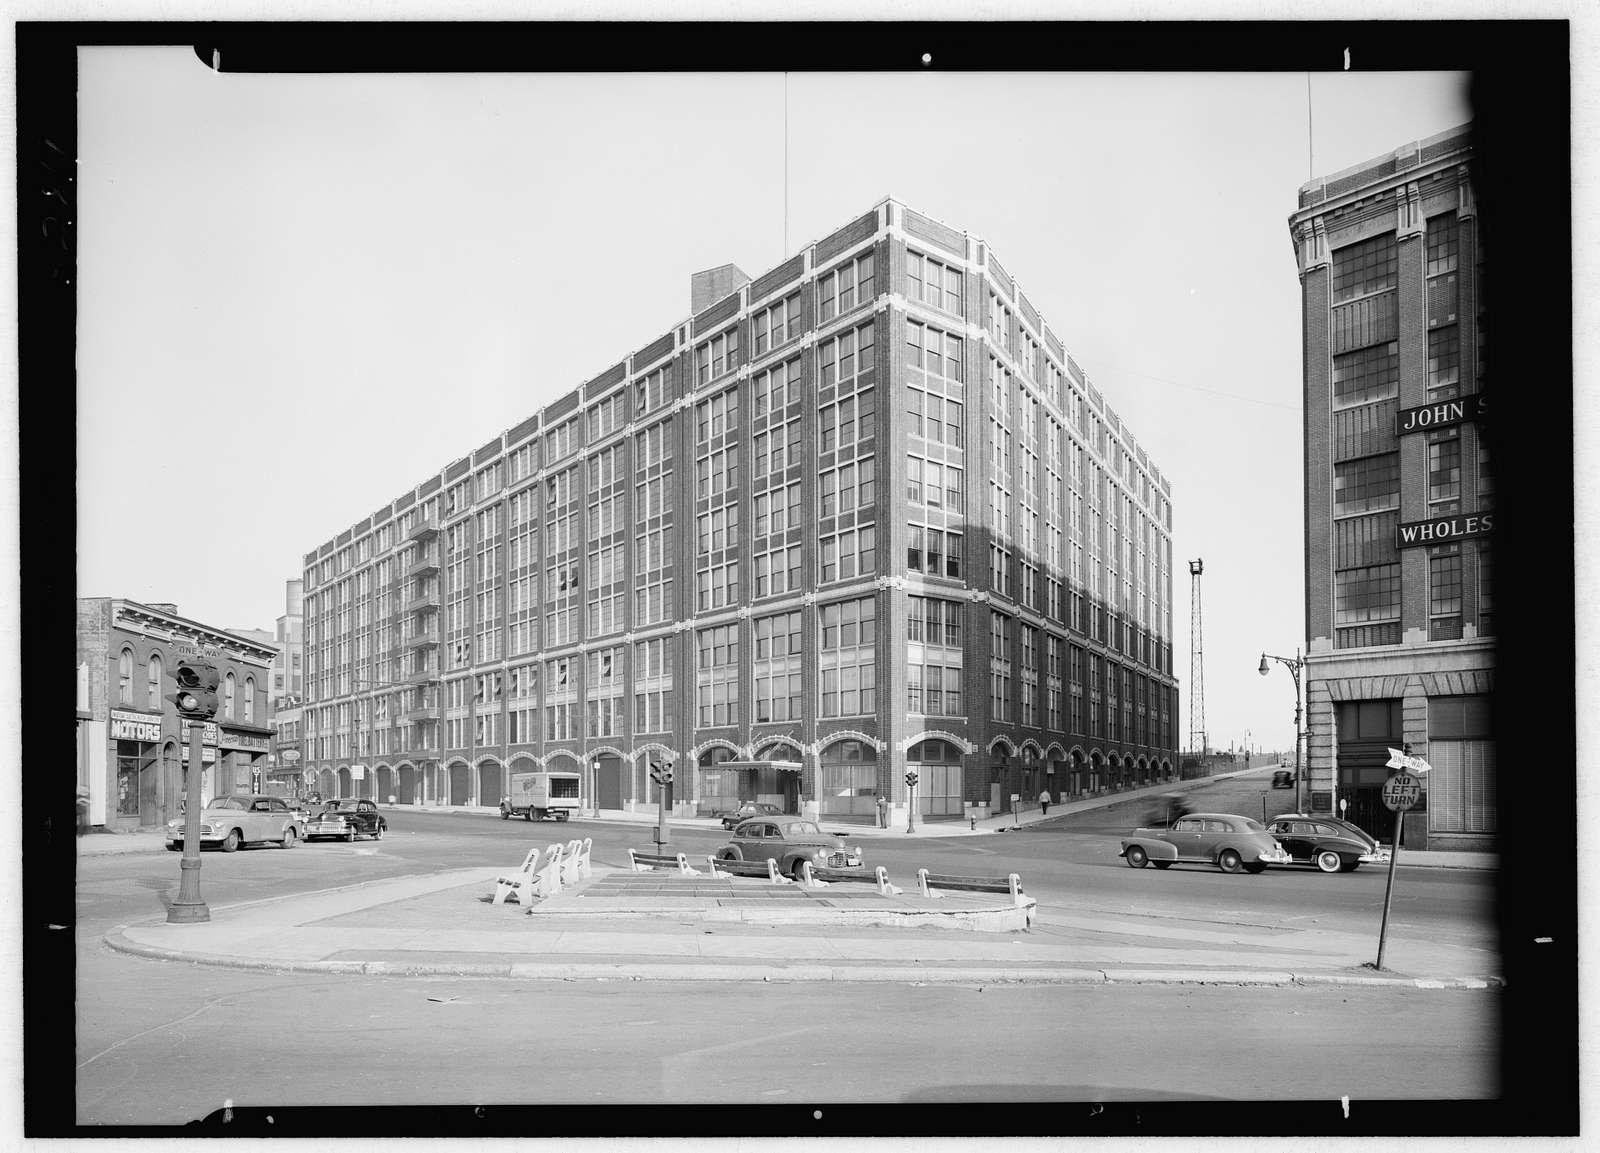 E.R. Squibb & Son, Northern Blvd., Long Island City. Exterior